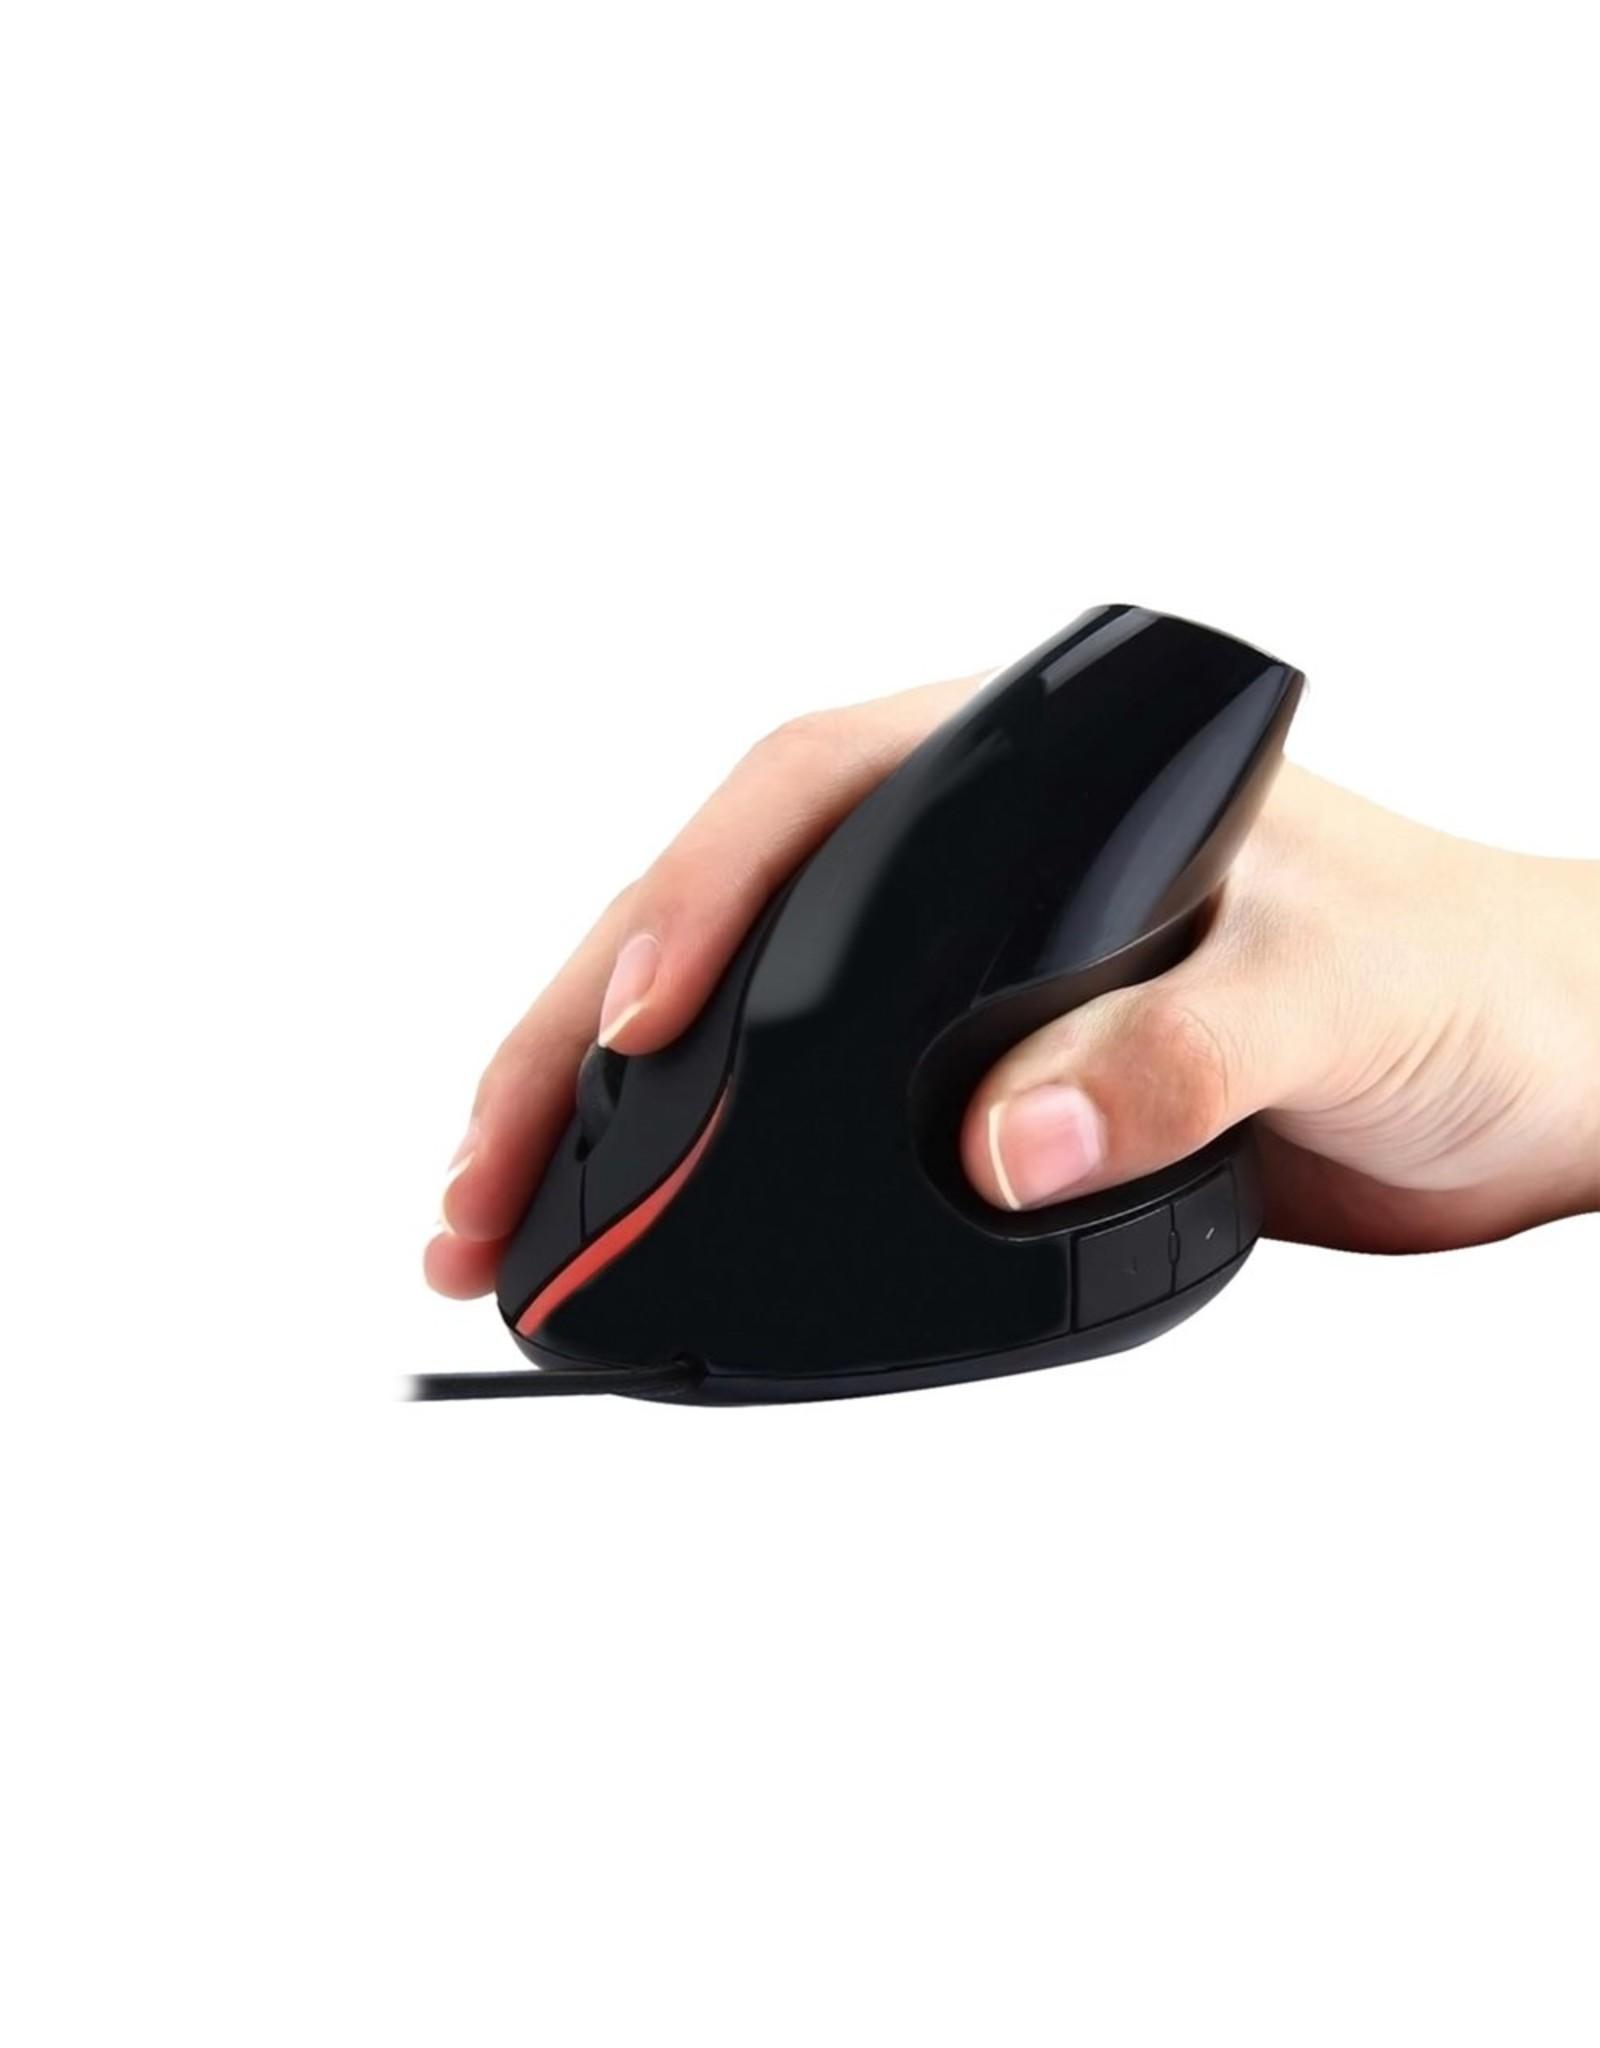 Ewent Vertical ergonomic mouse, usb